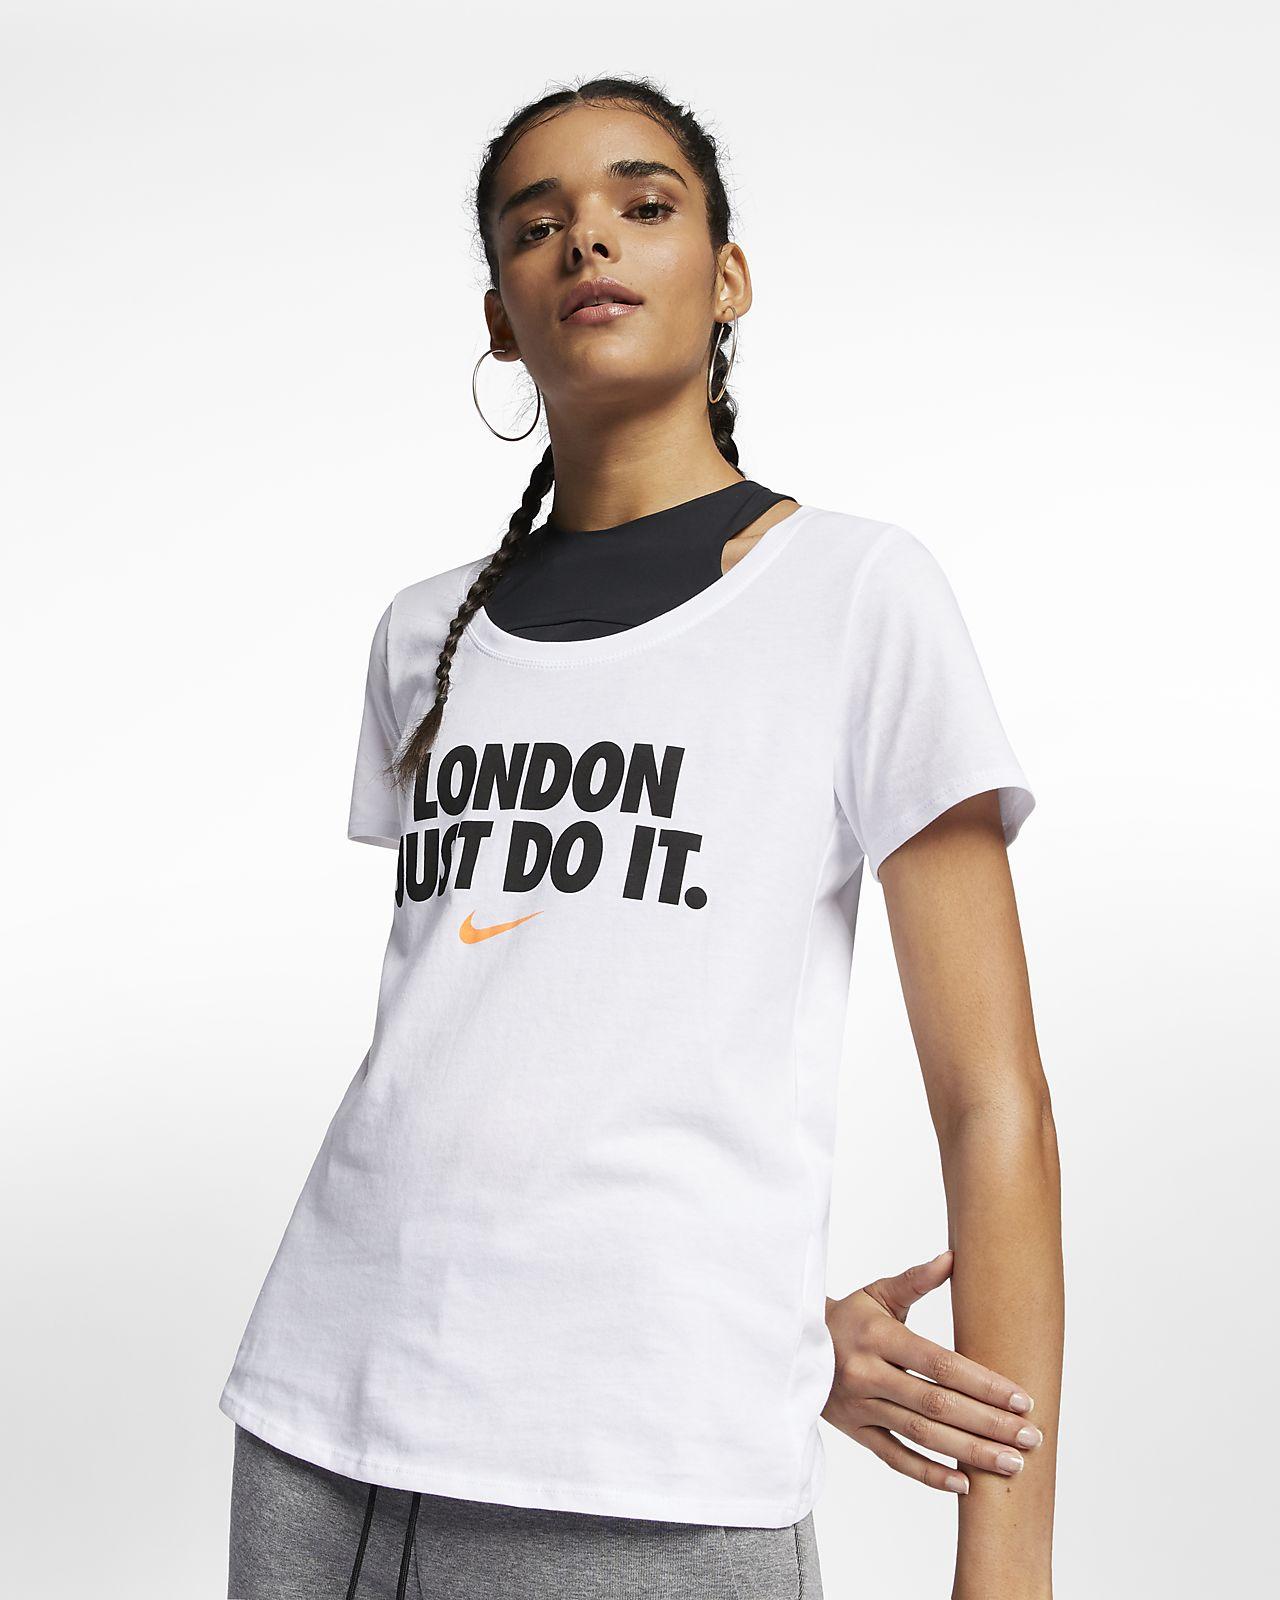 Tee-shirt JDI Nike Sportswear (London) pour Femme